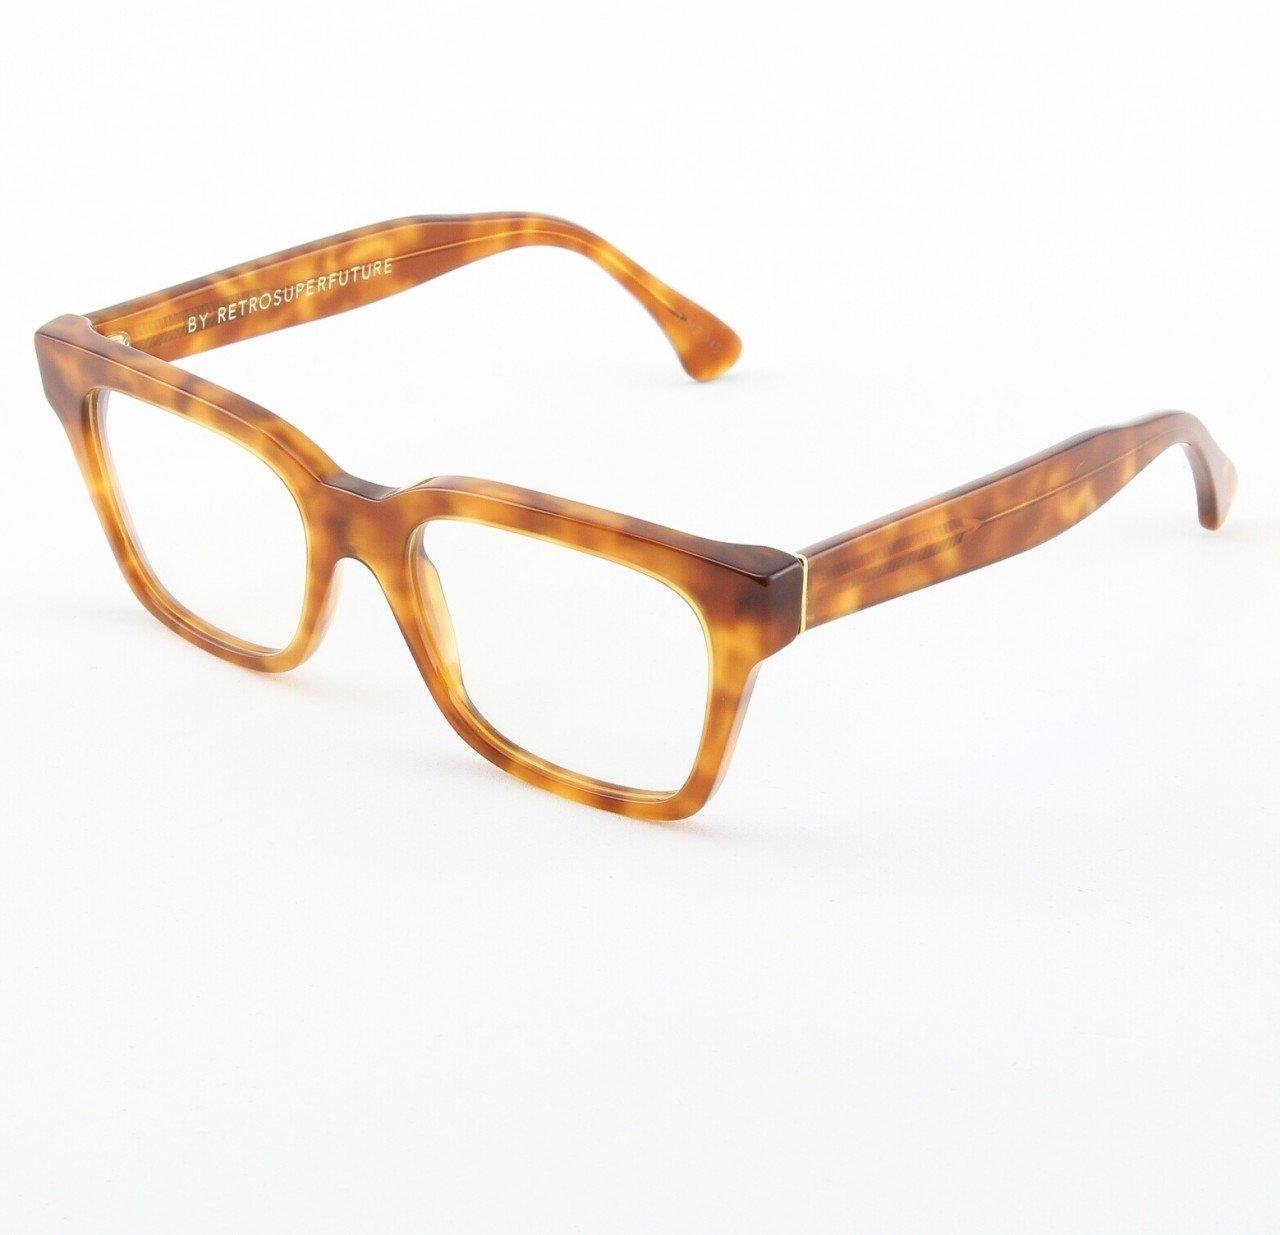 Super America 625 Eyeglasses Havana with Clear Zeiss Lenses by RETROSUPERFUTURE